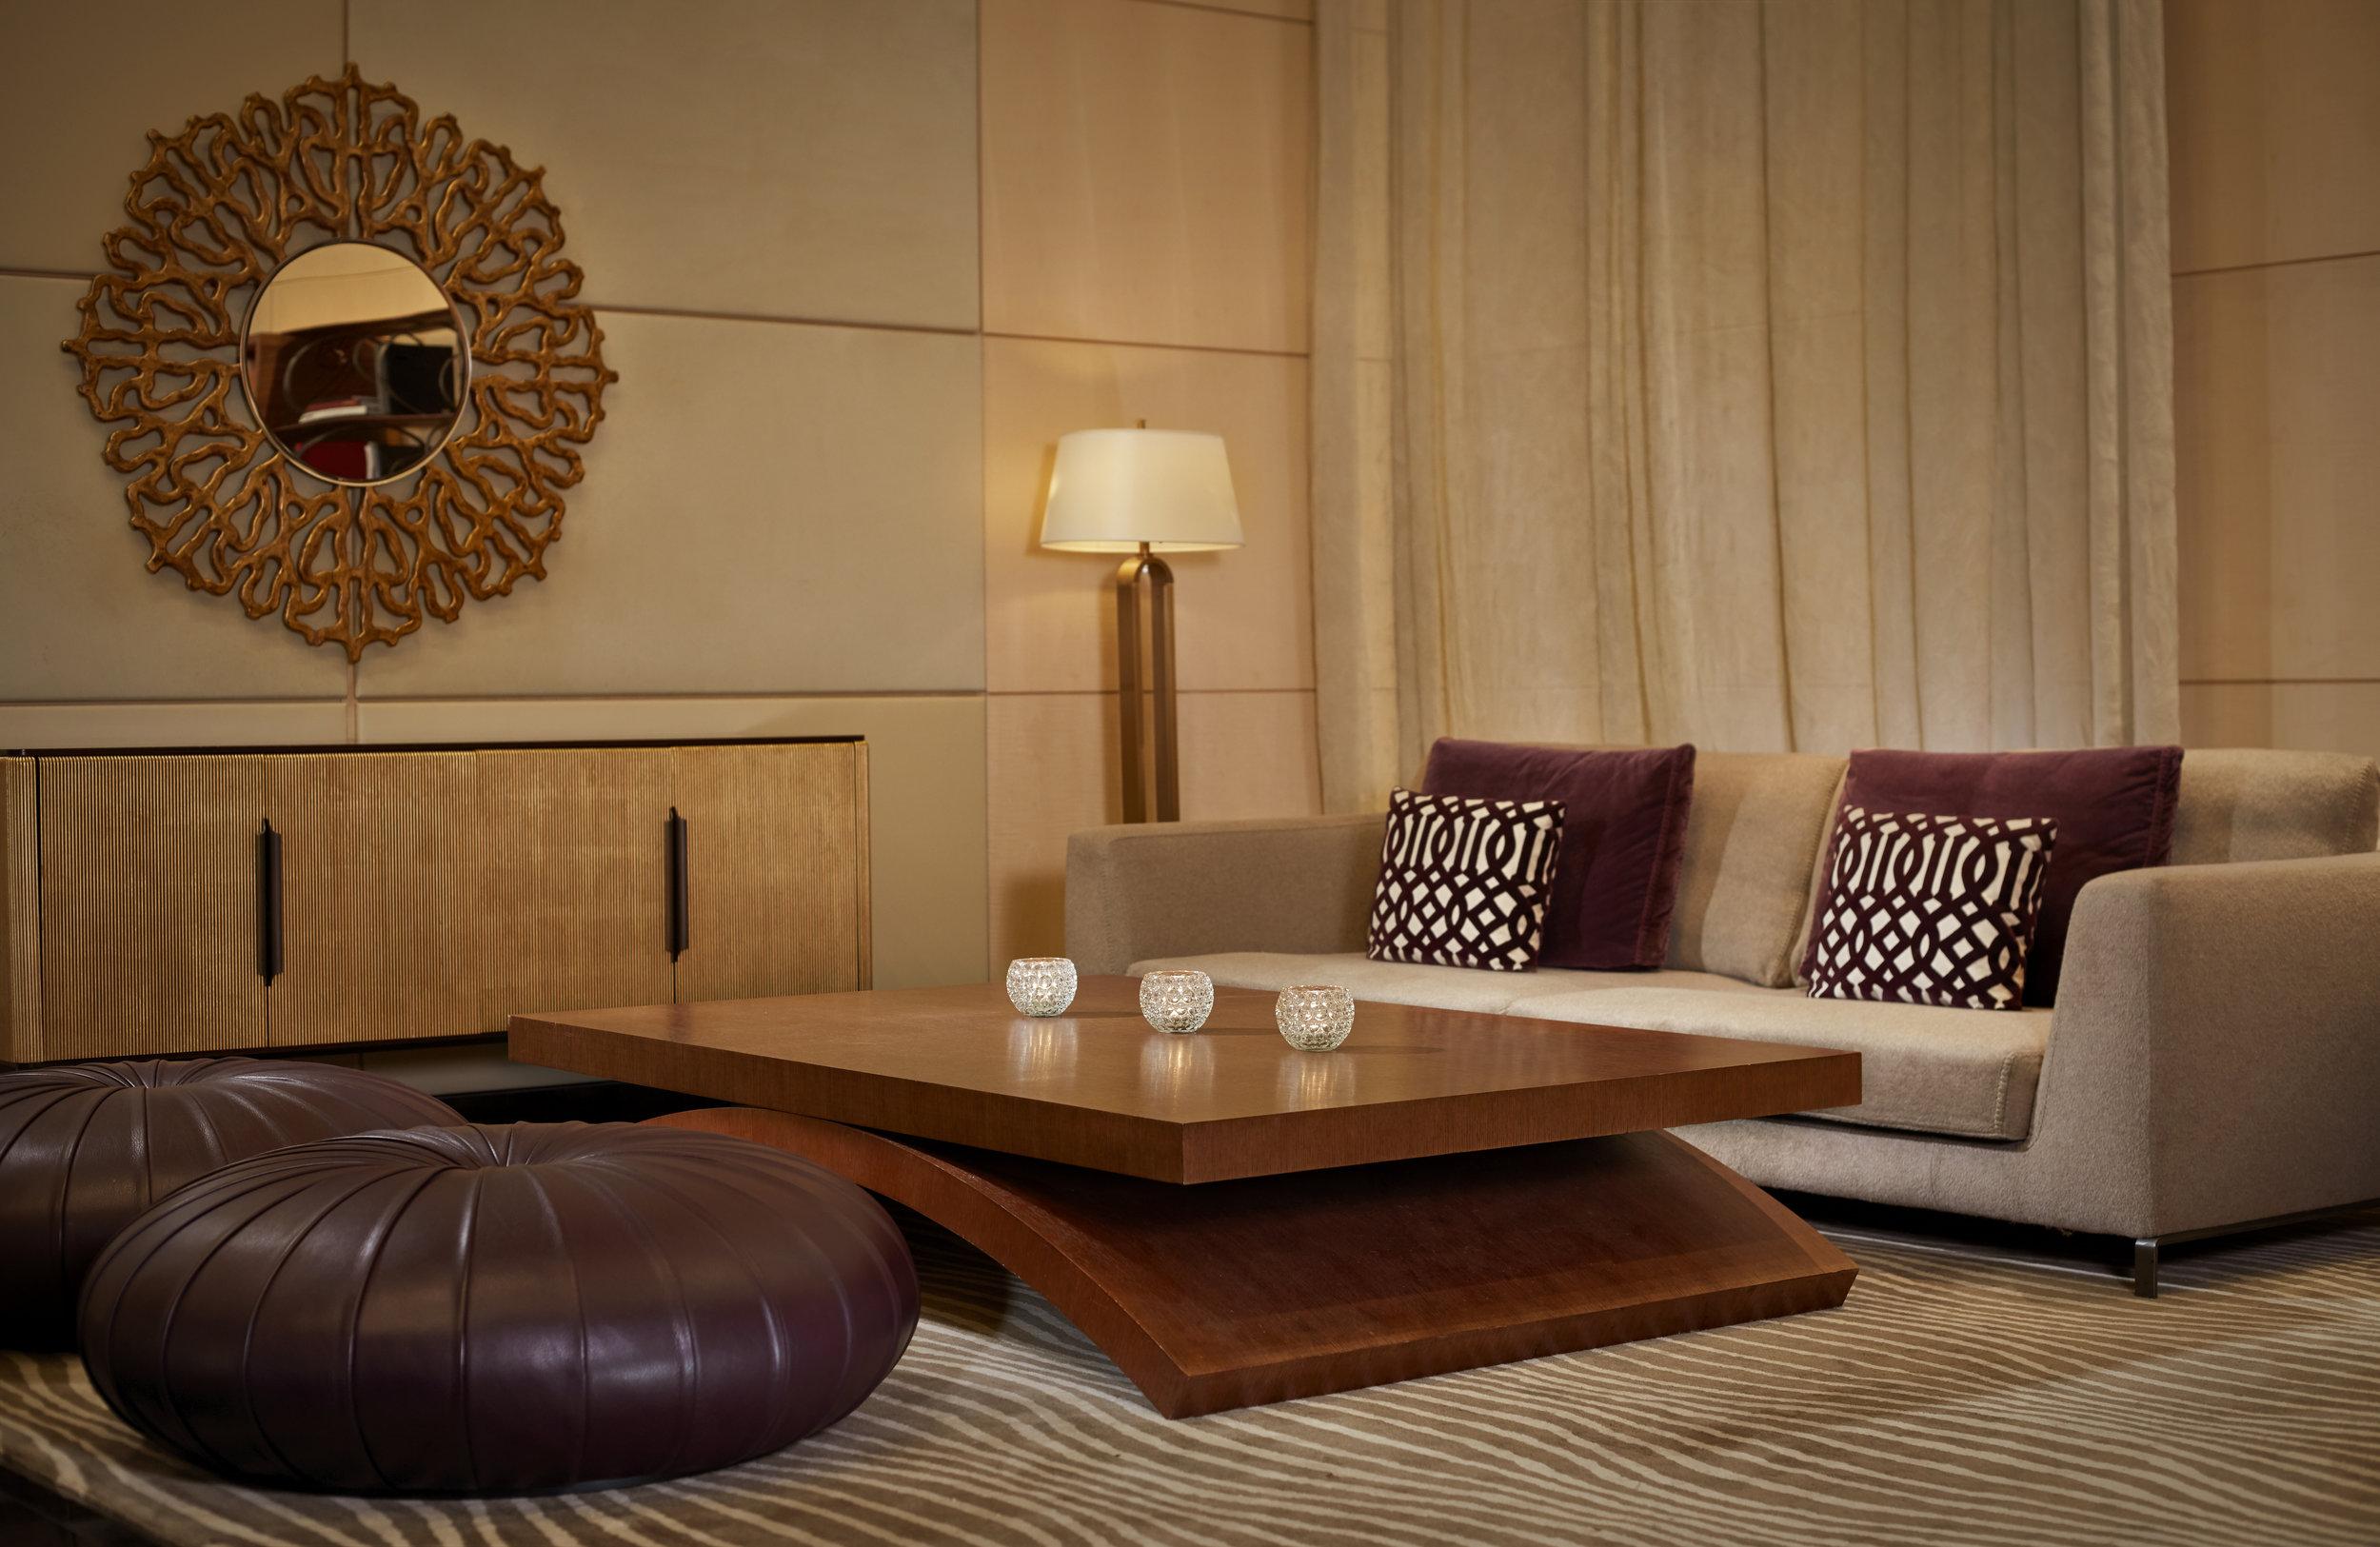 Park-Hyatt-Zurich-Lobby-Lounge-Big-table.jpg